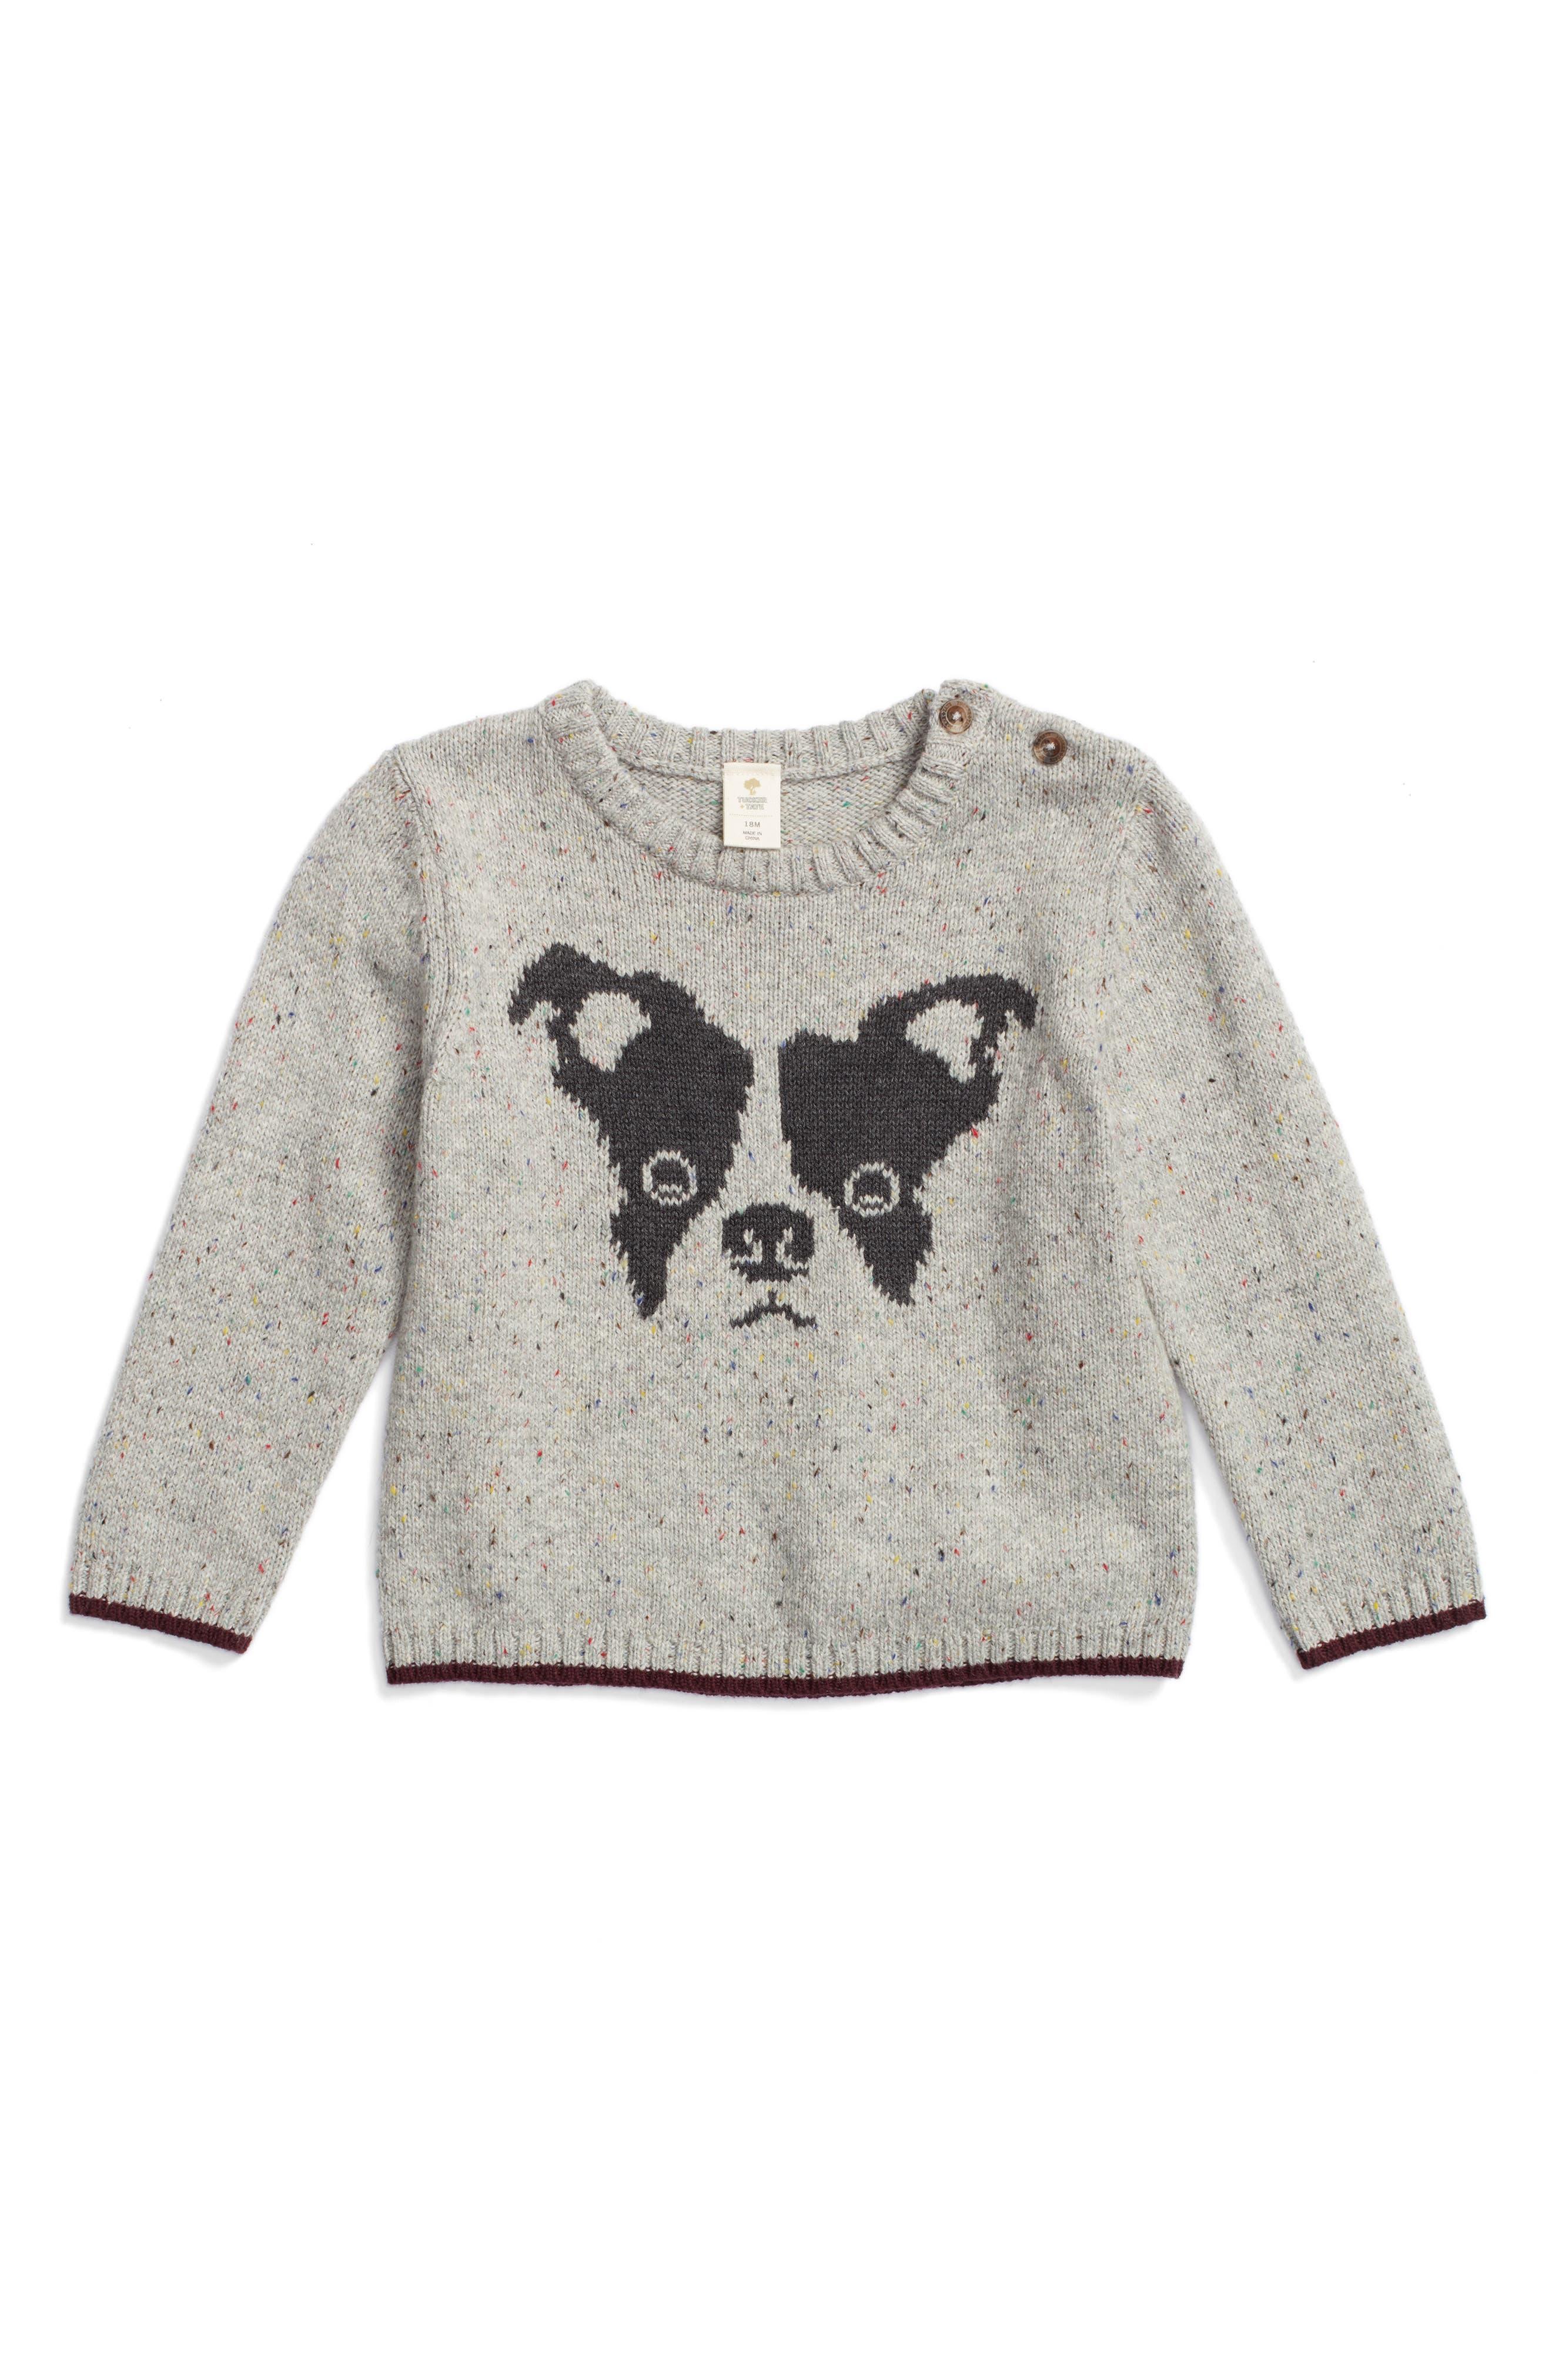 TUCKER + TATE Intarsia Knit Dog Sweater